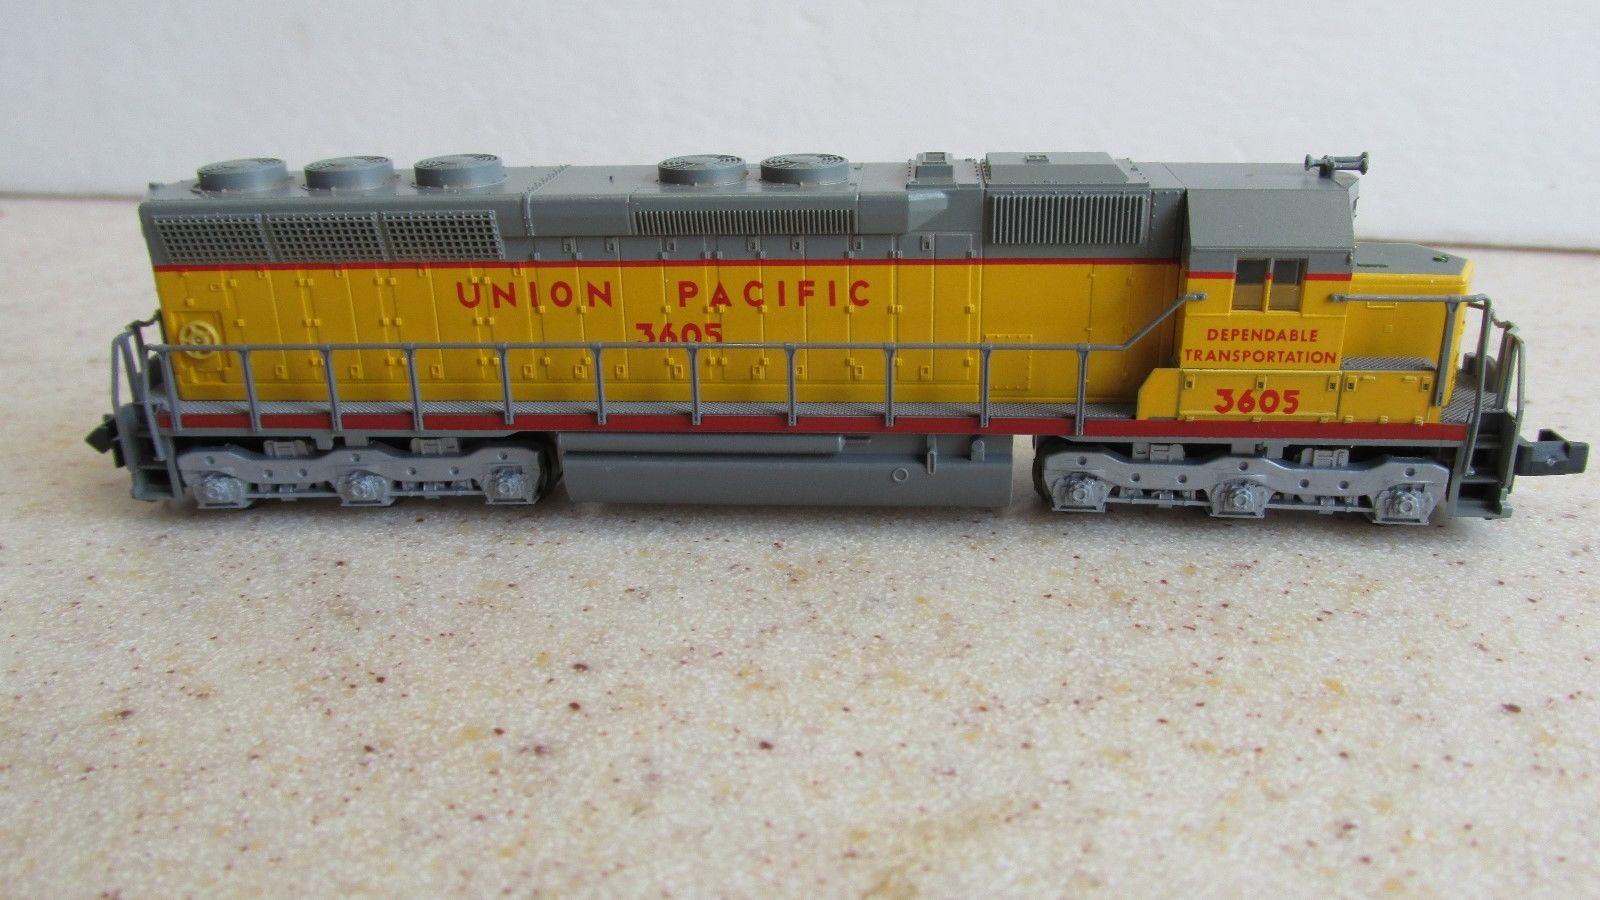 N Scale - Kato USA - 176-31B - Locomotive, Diesel, EMD SD45 - Union Pacific - 3605